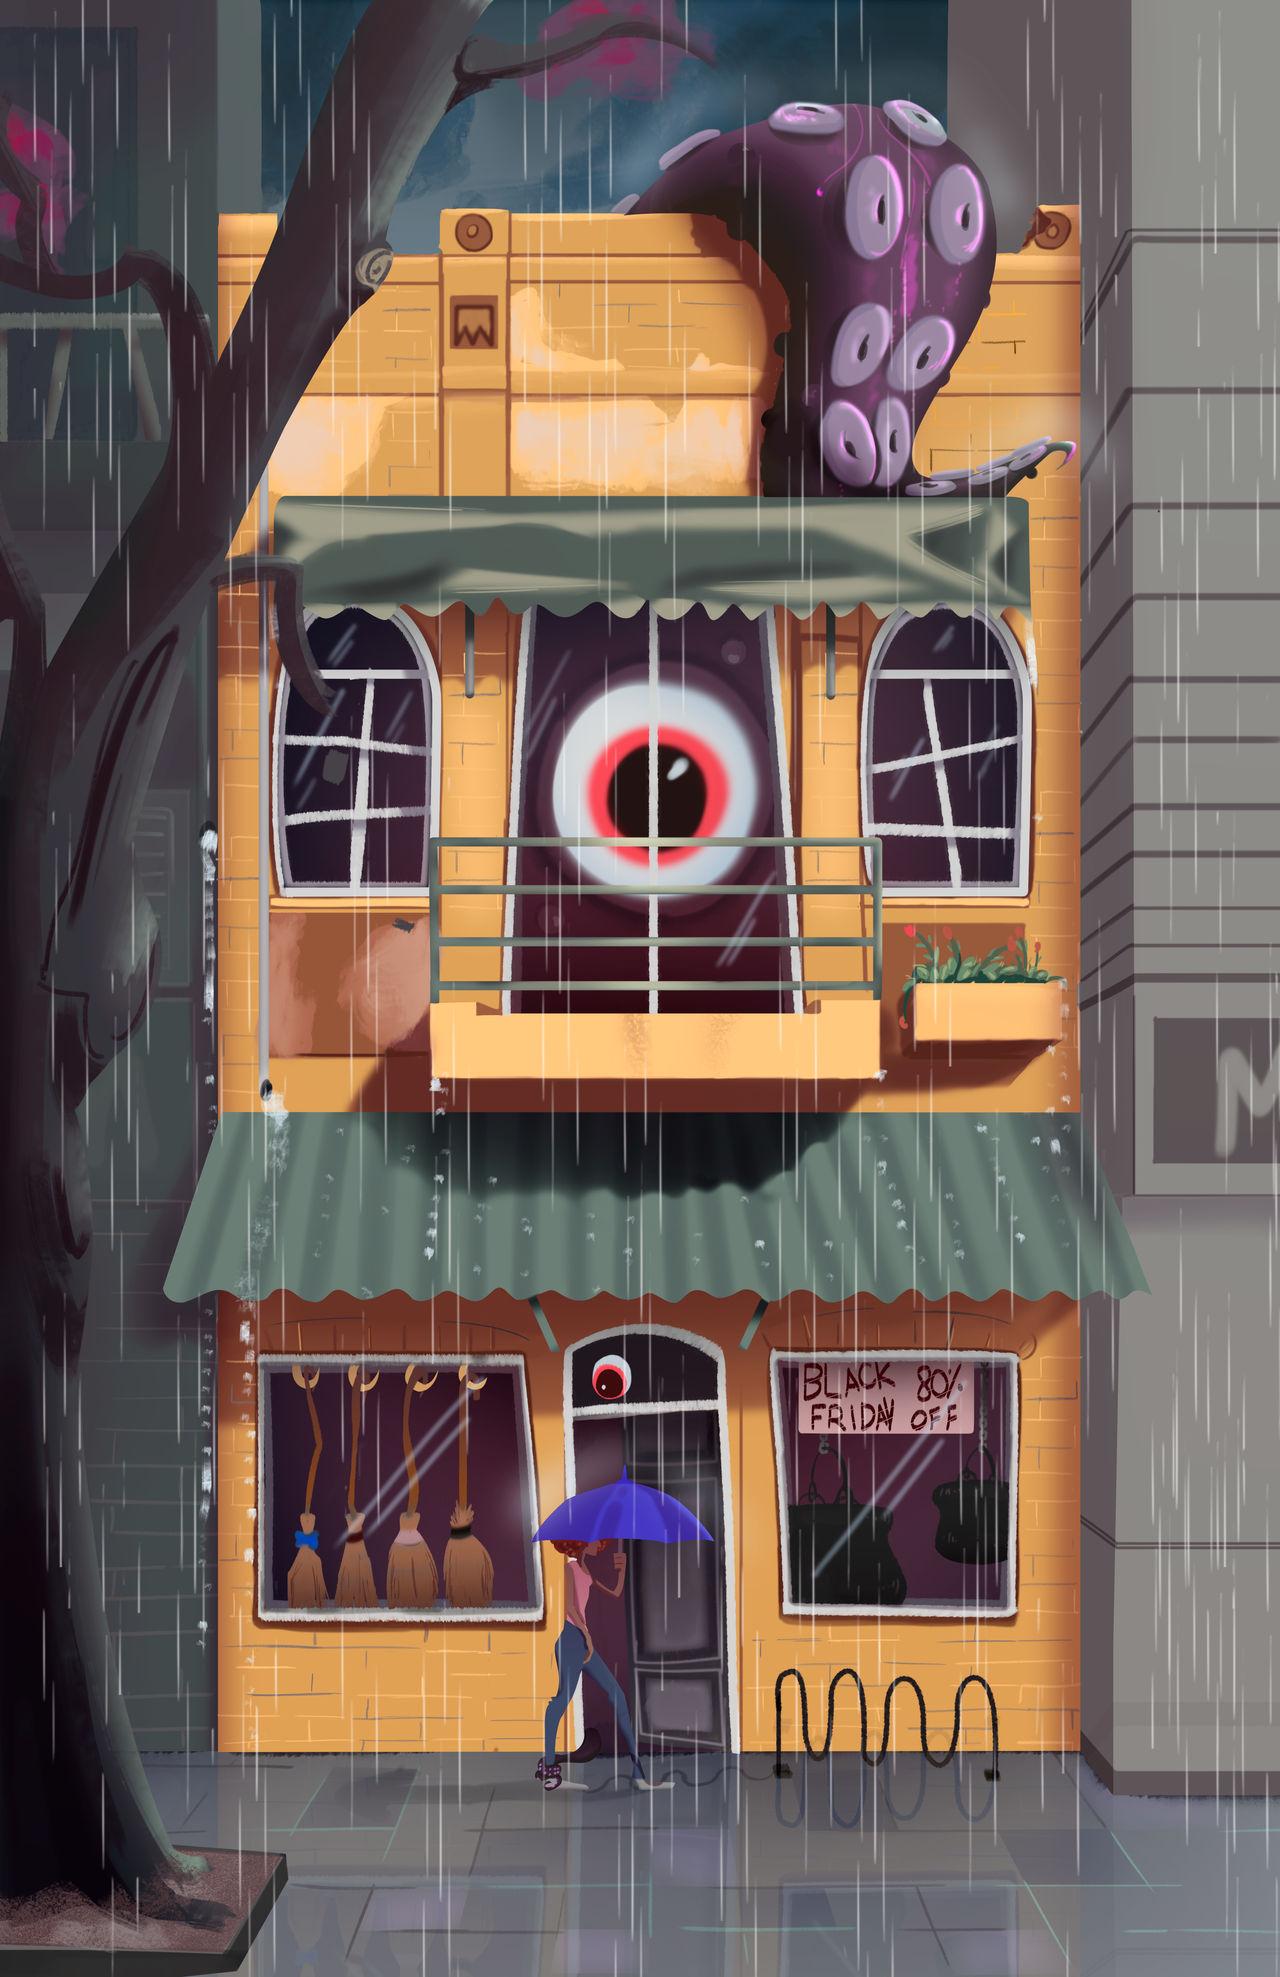 A Spooky shop